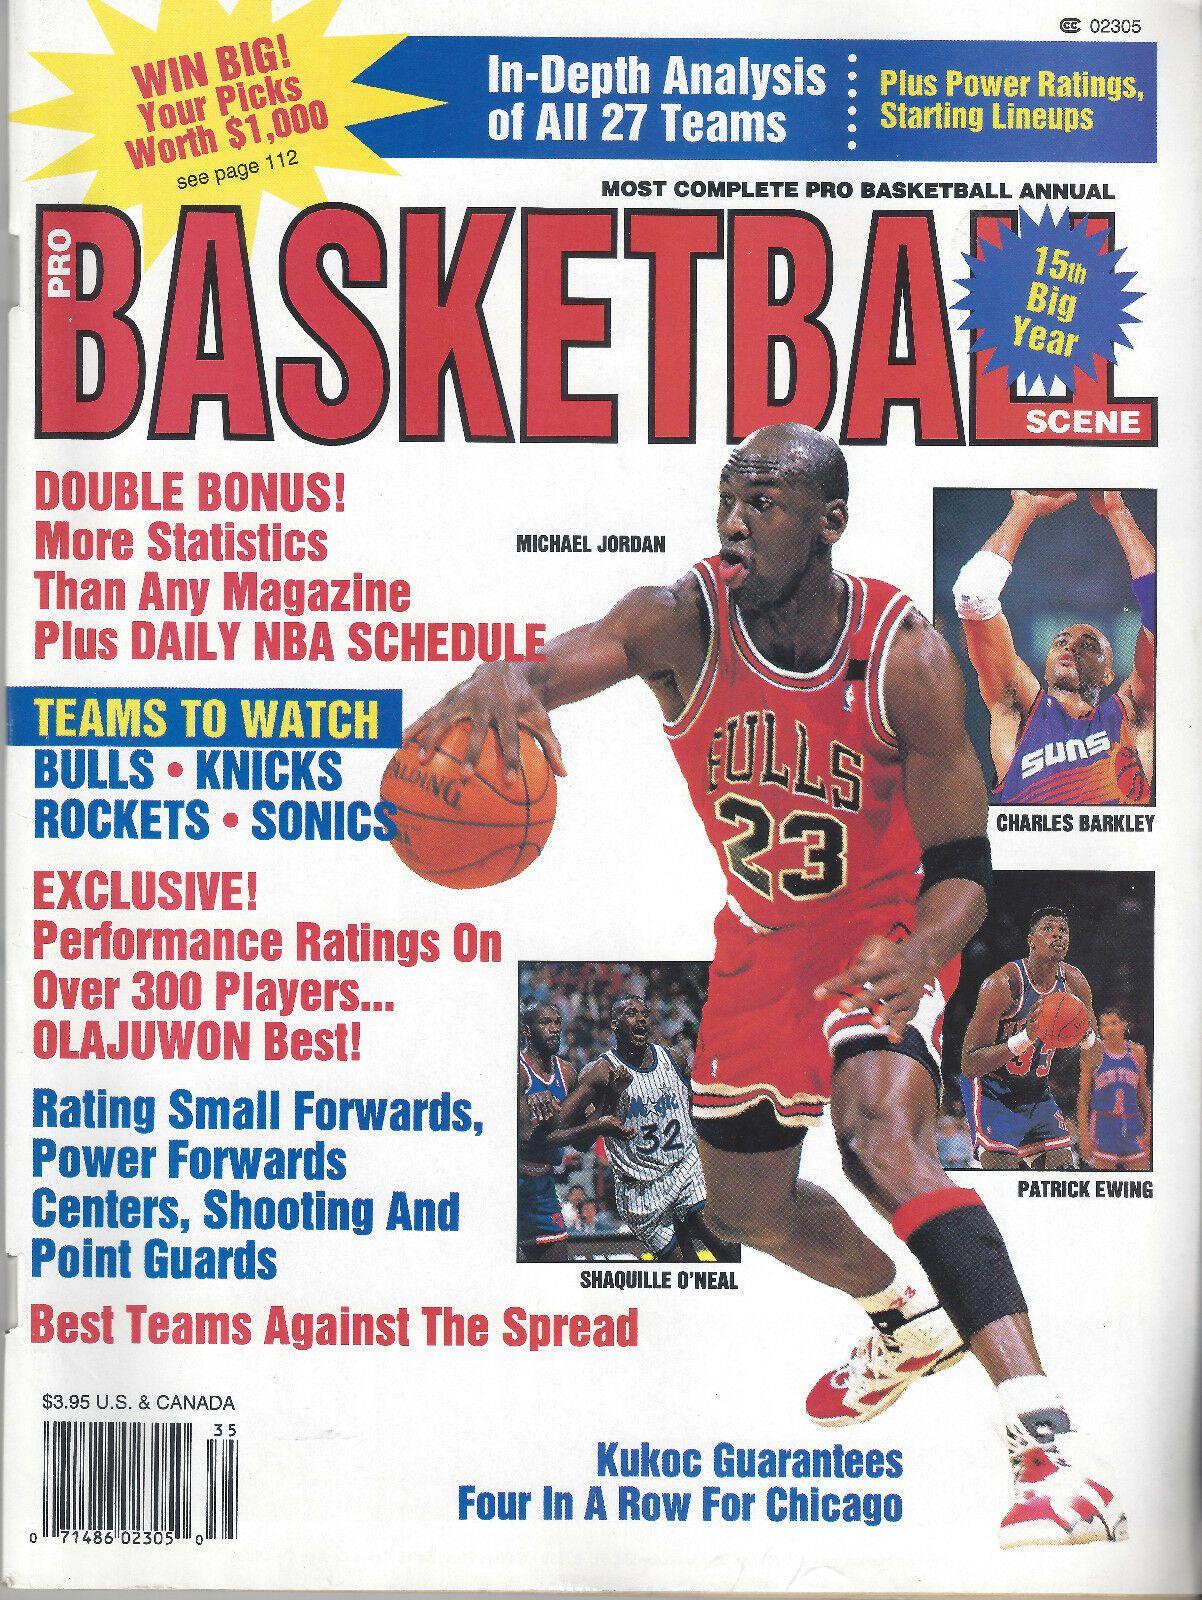 199394 michael jordan cover pro basketball scene annual